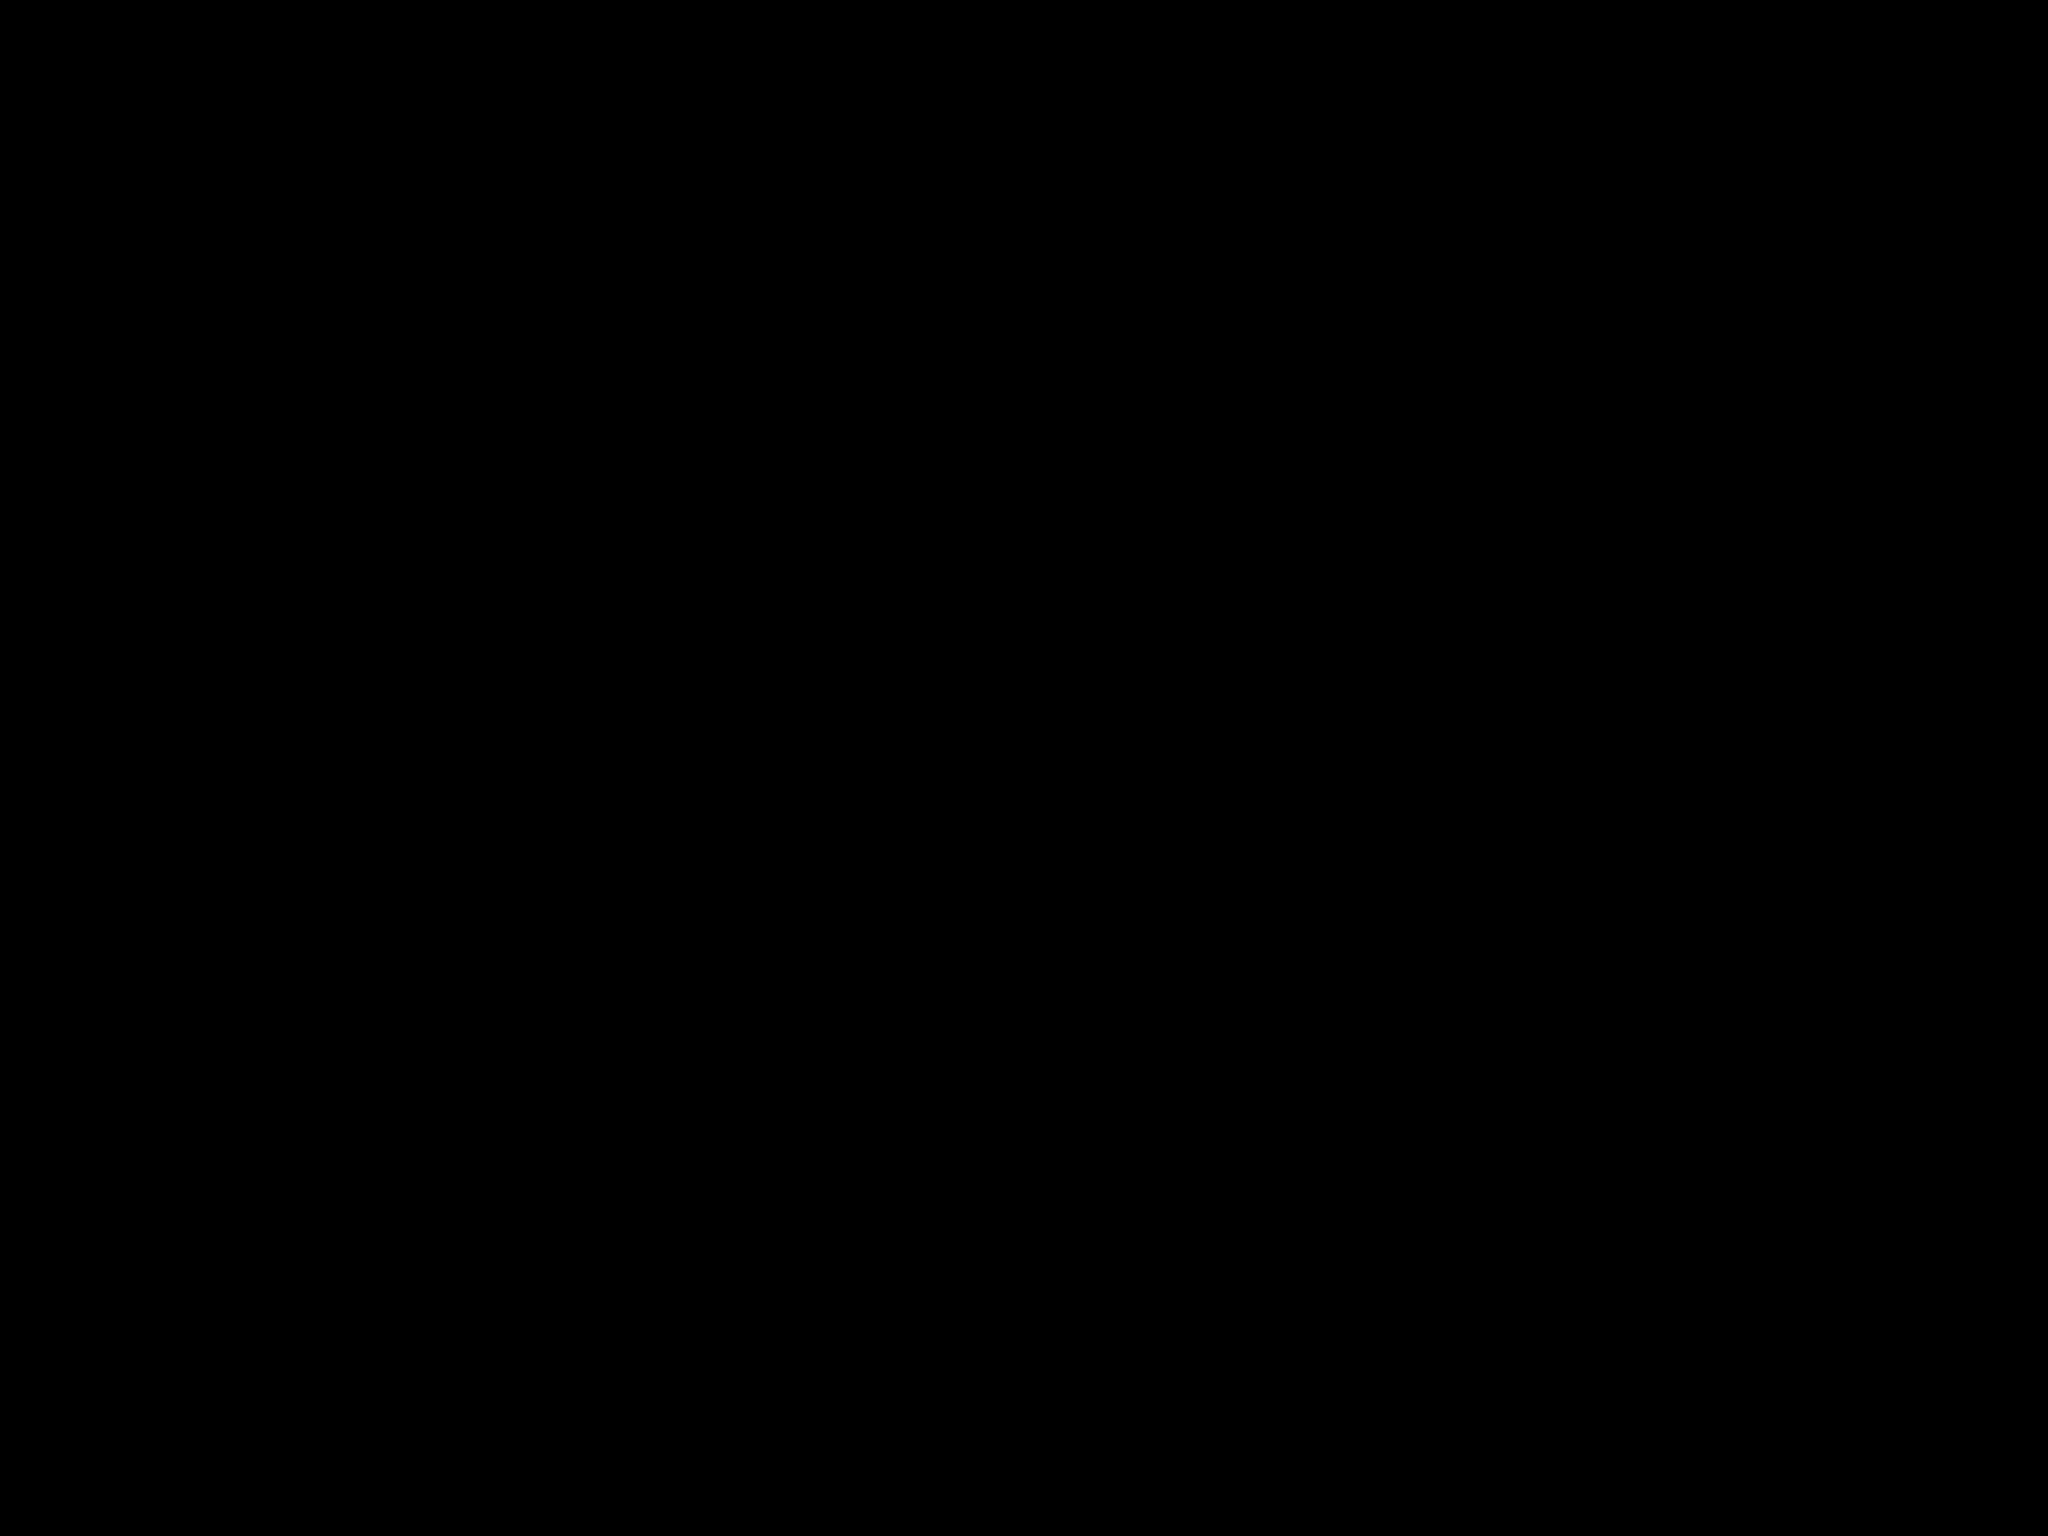 Douglas geschaafde paal | 12 x 12 cm